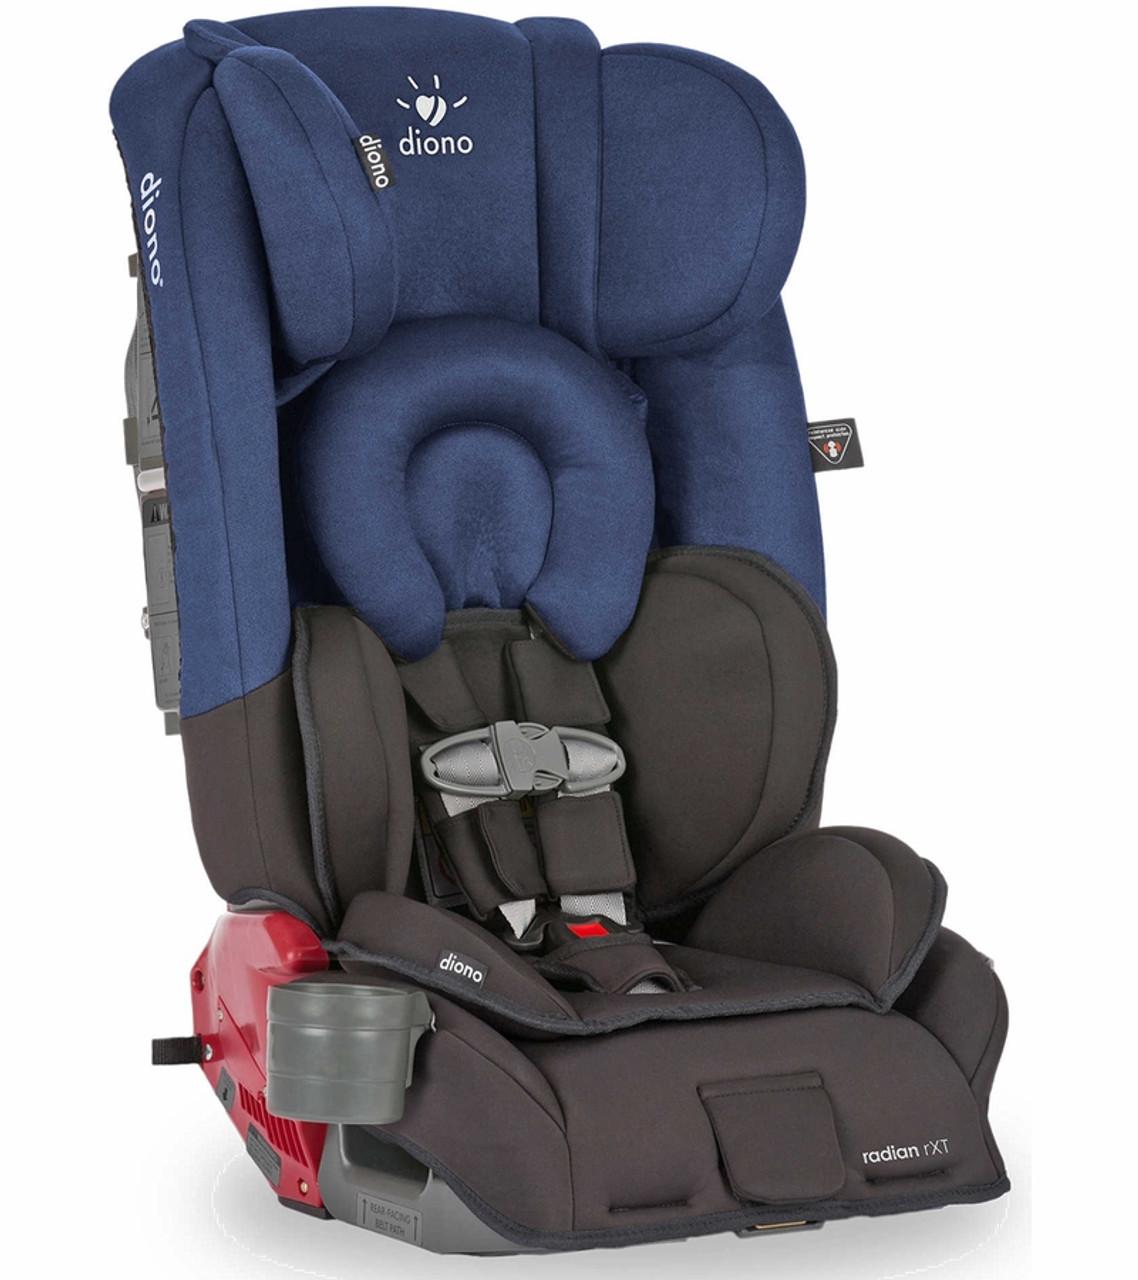 Diono Radian RXT Car Seat - Bellani Maternity